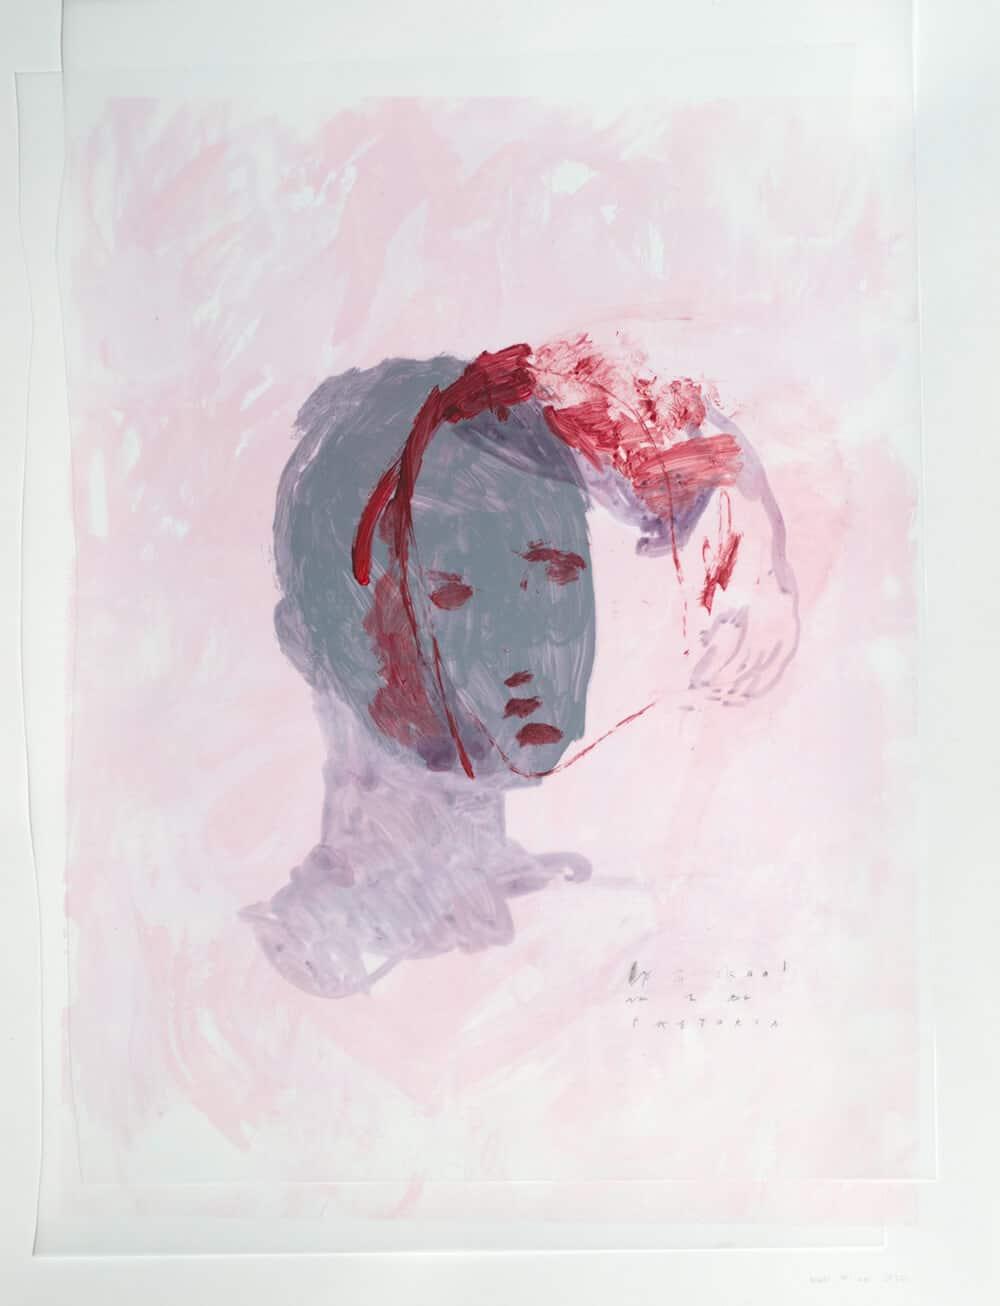 Elsabé Milandri, Op 'n skaal van 1 tot Pretoria, 2017. Acrylic on Drafting Film and Silkscreen Monotype, 66 x 51cm. Courtesy of SMITH.